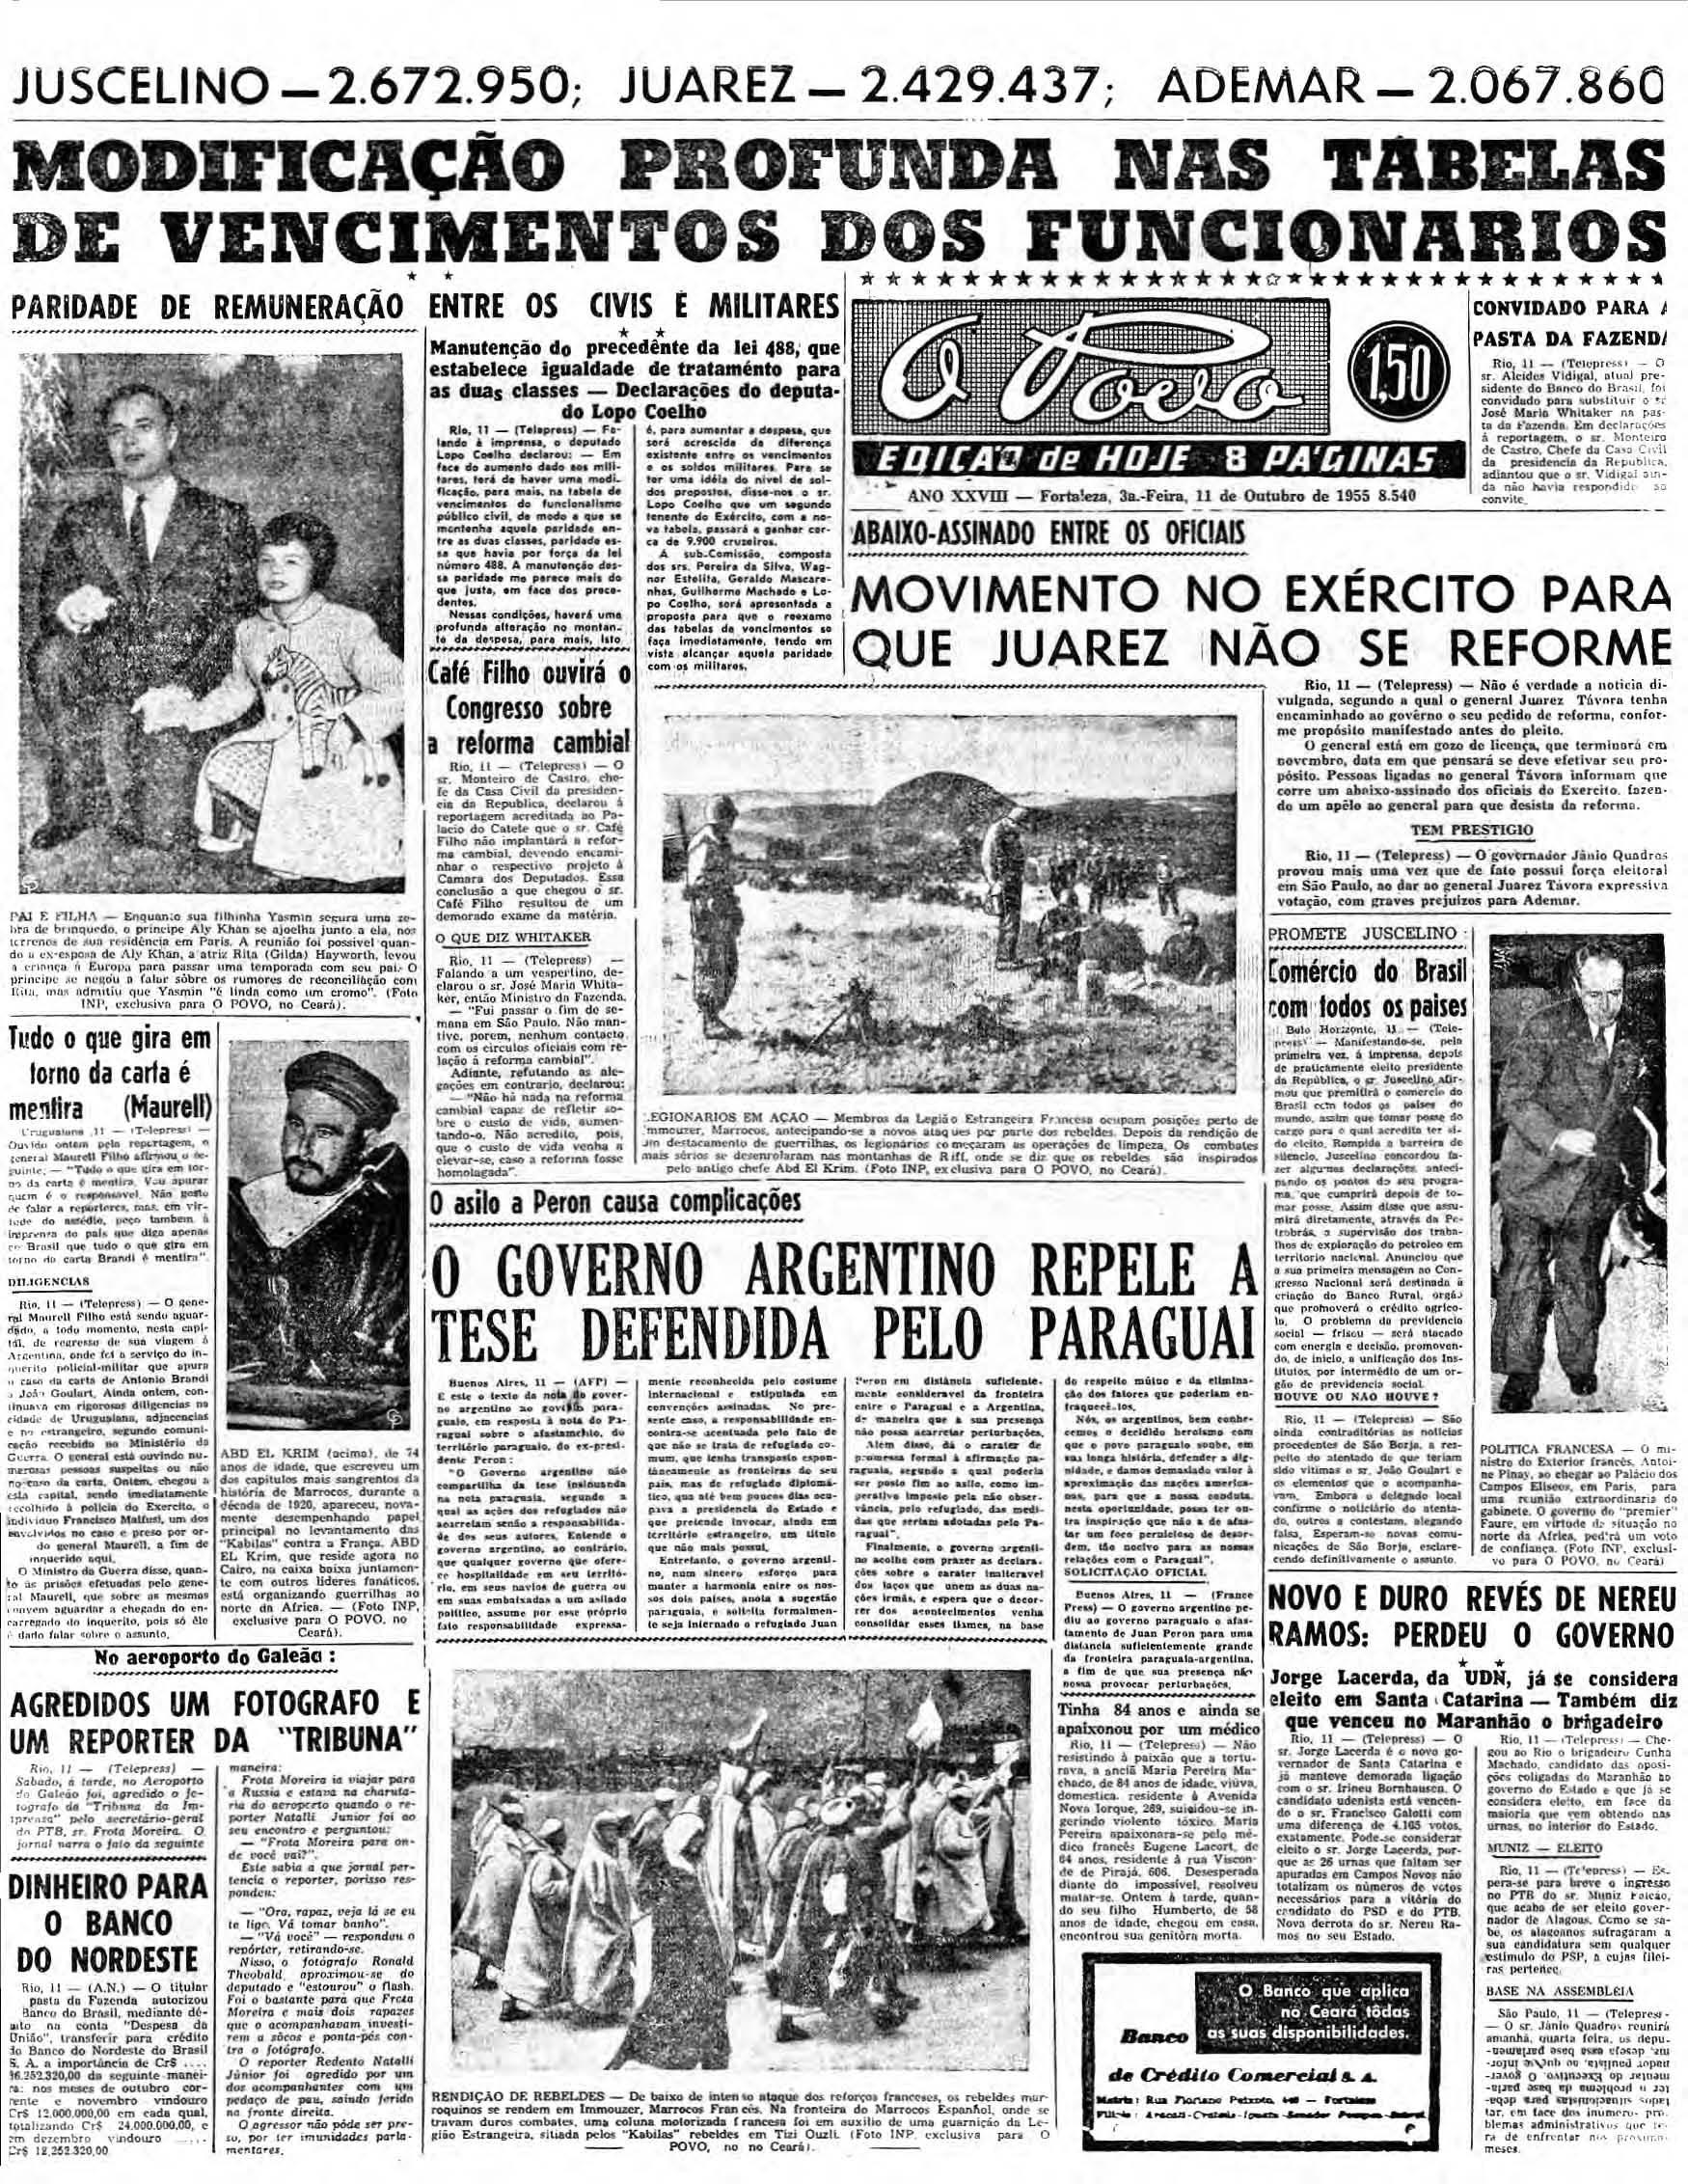 11-10-1955